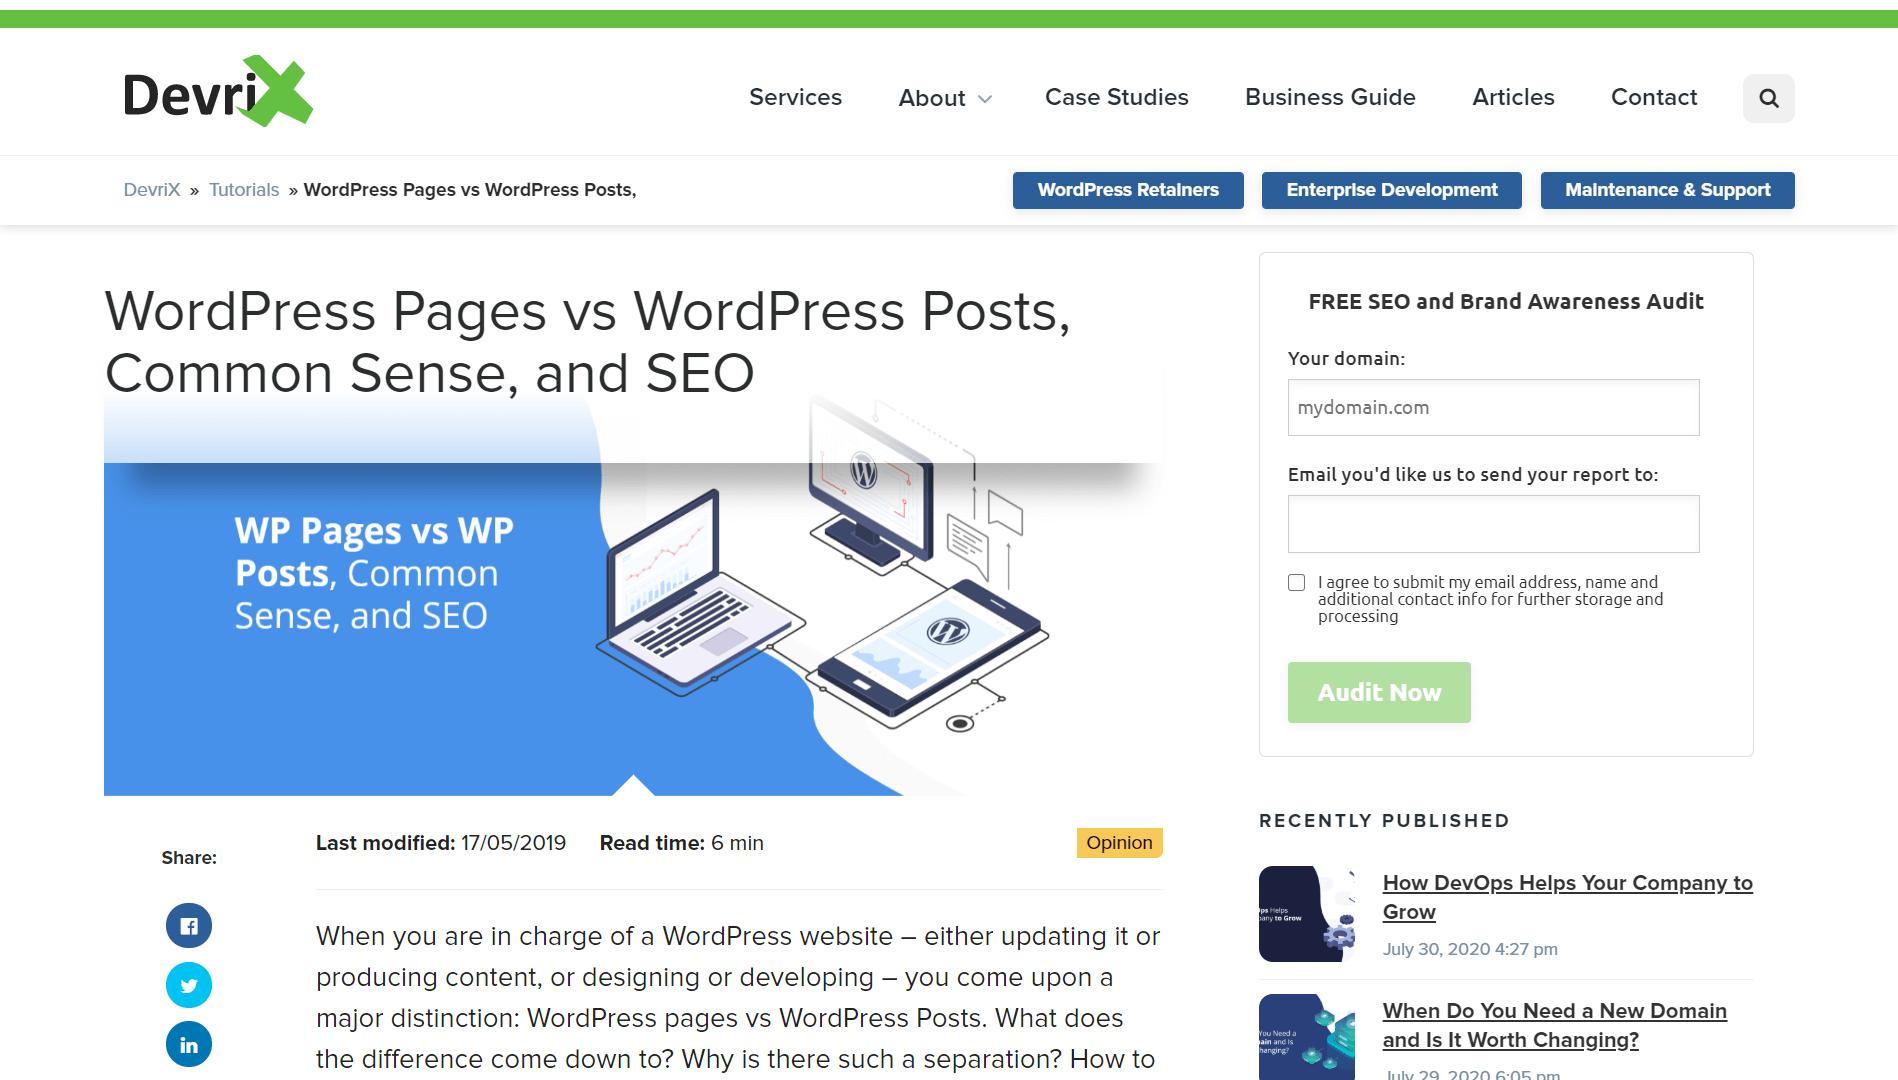 WordPress Pages vs WordPress Posts Common Sense and SEO